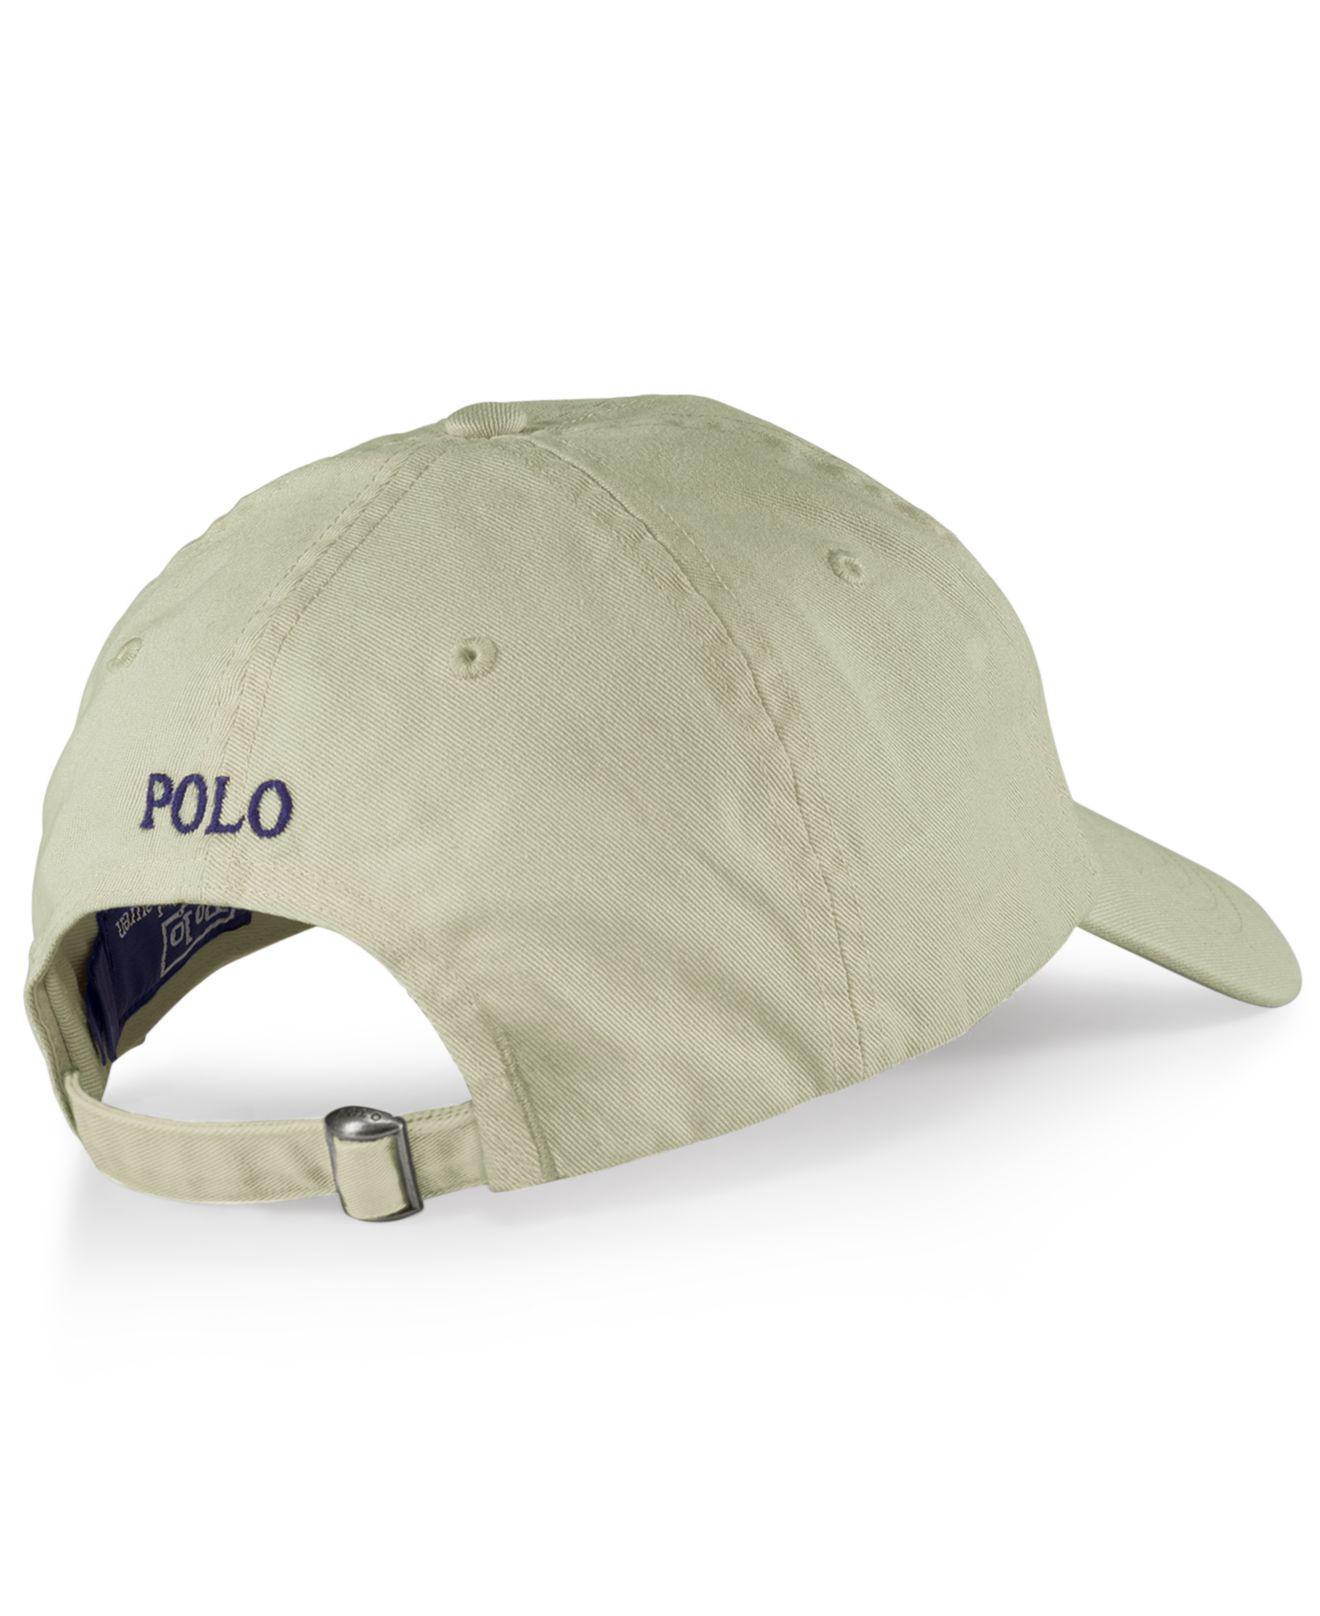 28e6f932 Amazon.com: Polo Ralph Lauren - Baseball Caps / Hats & Caps .